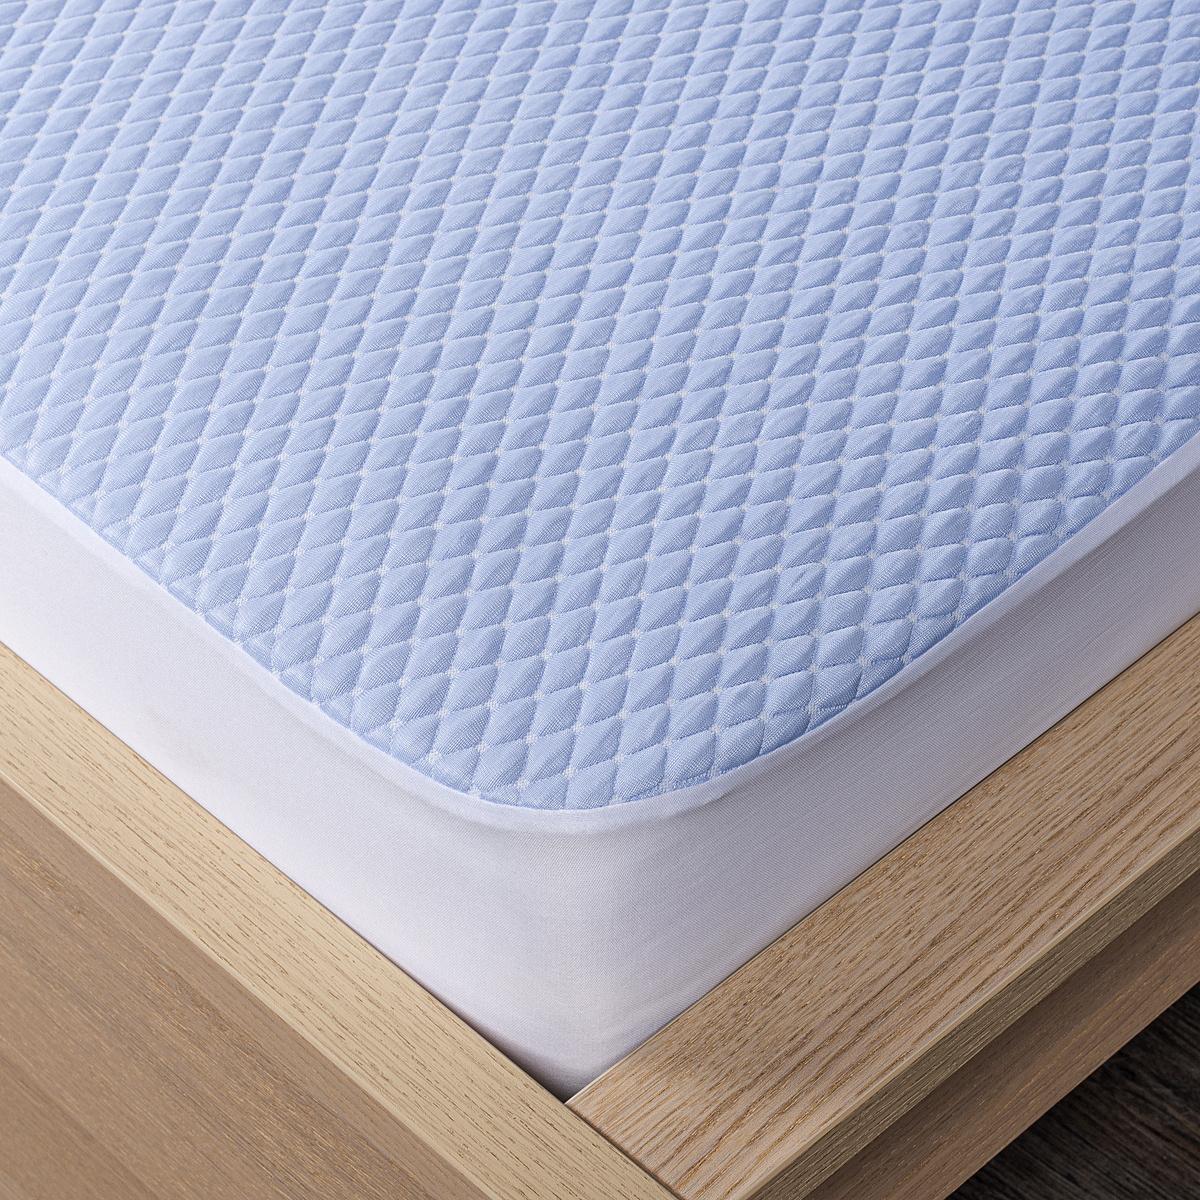 4Home Chladicí chránič matrace s lemem Cooler, 90 x 200 cm